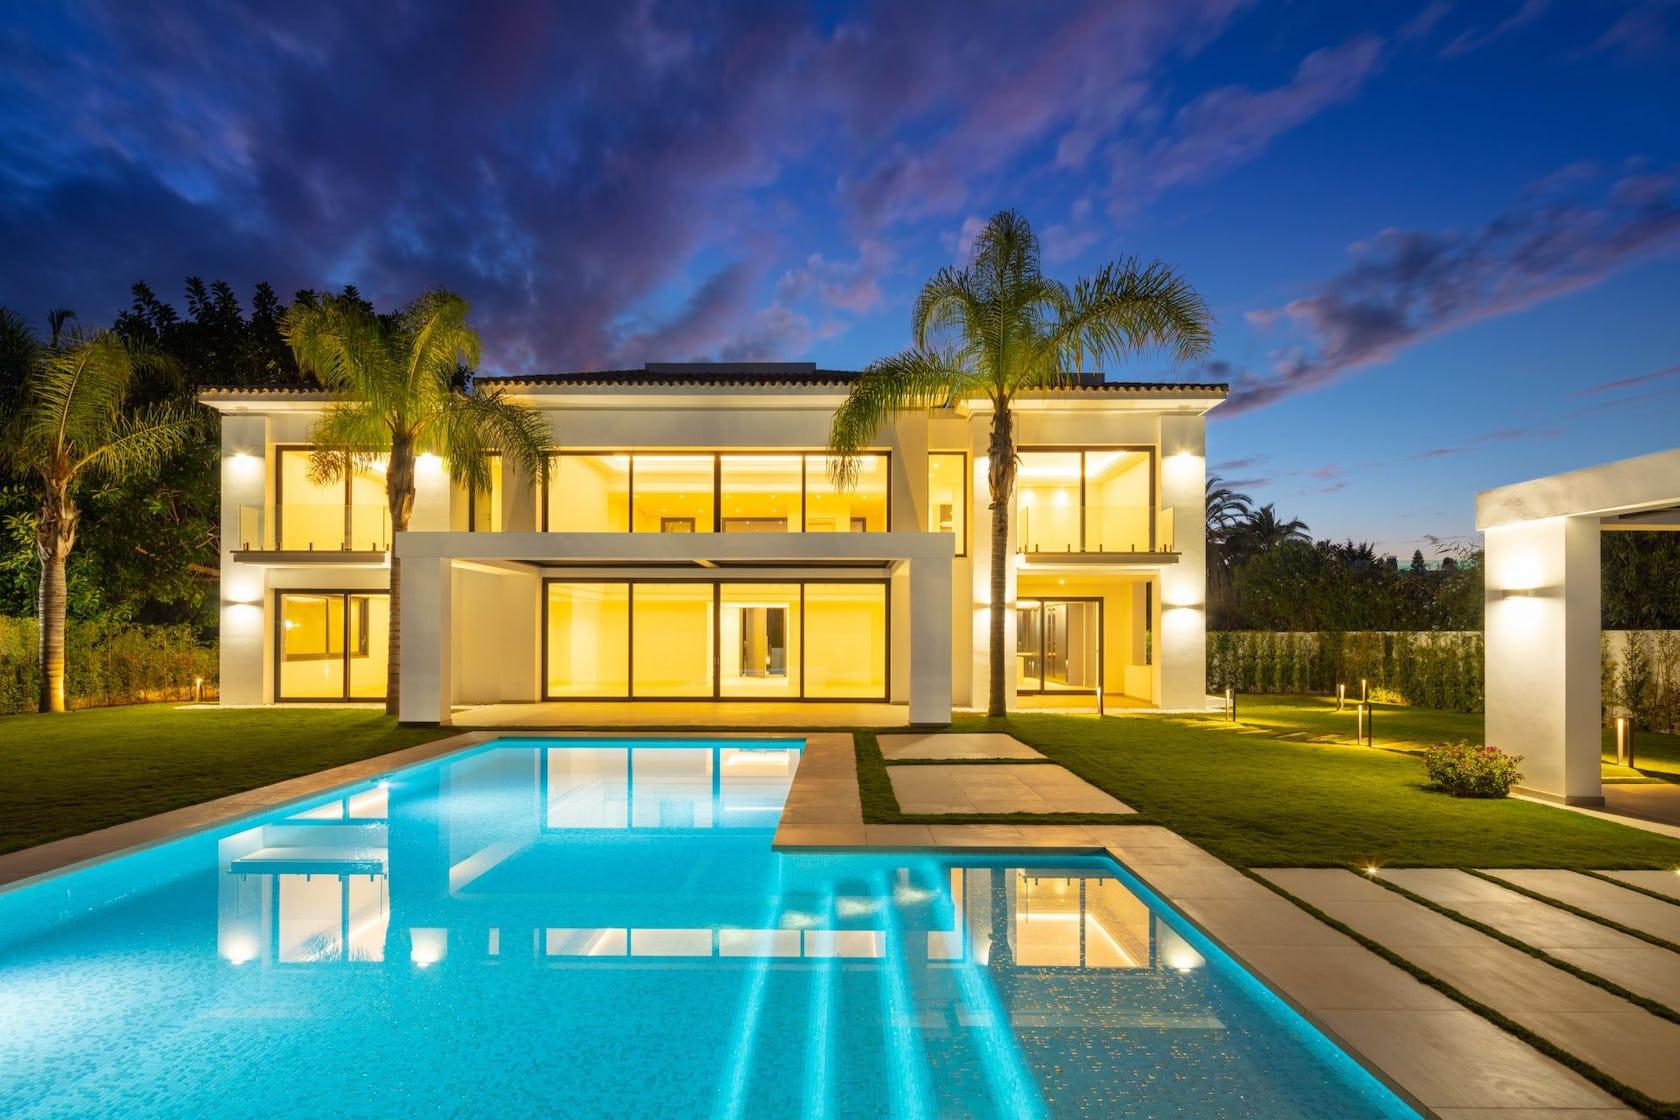 villa housing building house water mansion pool swimming pool